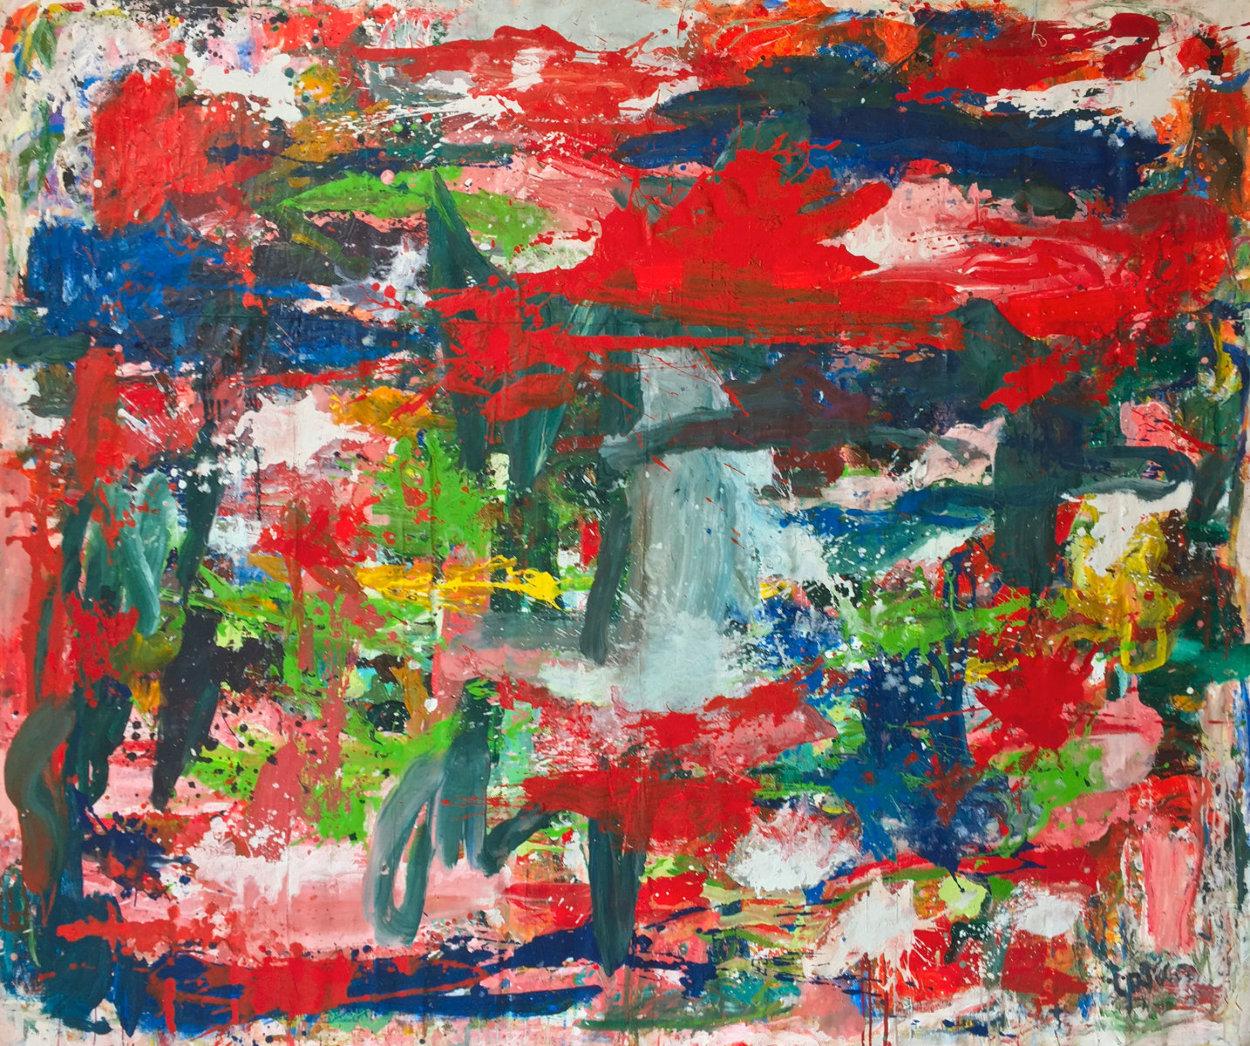 Major Dimensions 2019 90x79 Huge Original Painting by Costel Iarca